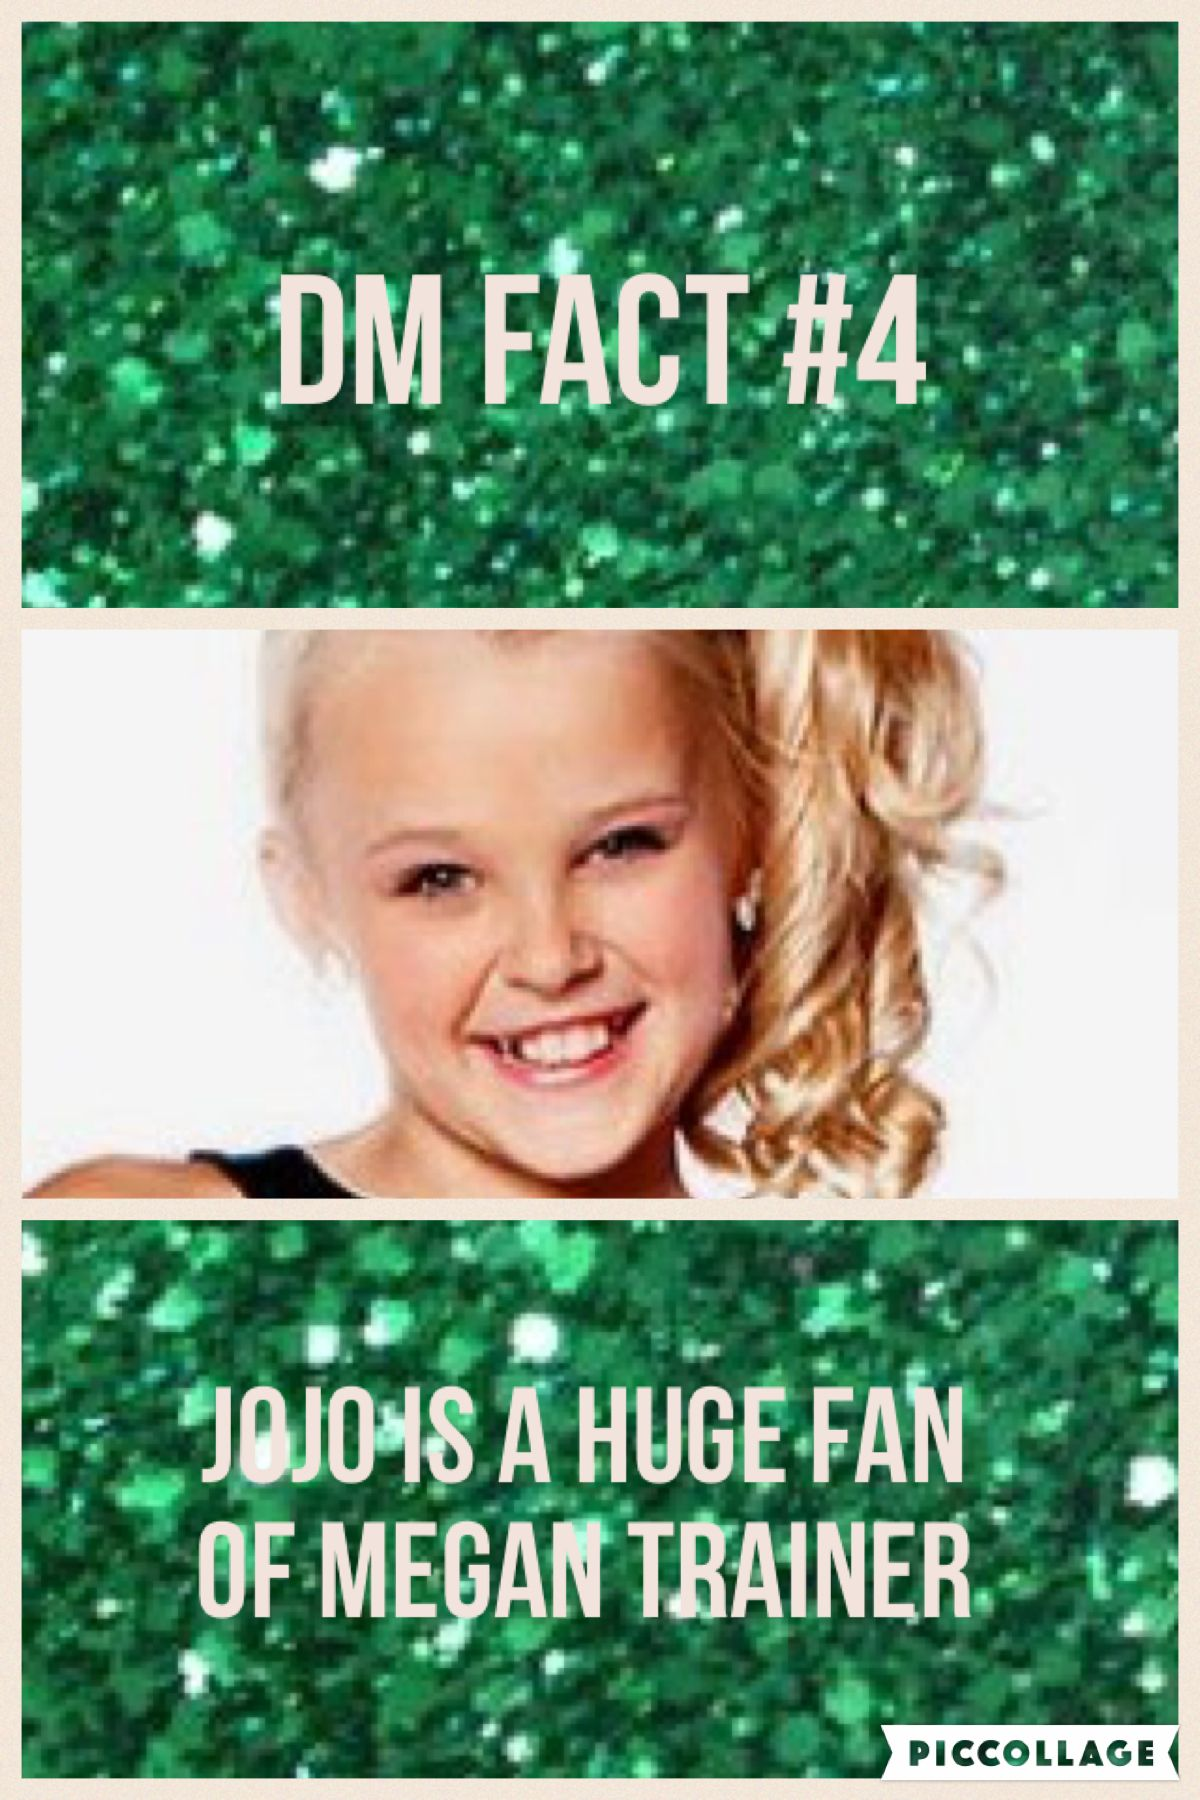 Lil jojo dead body pictures to pin on pinterest - Jojo Siwa Fact